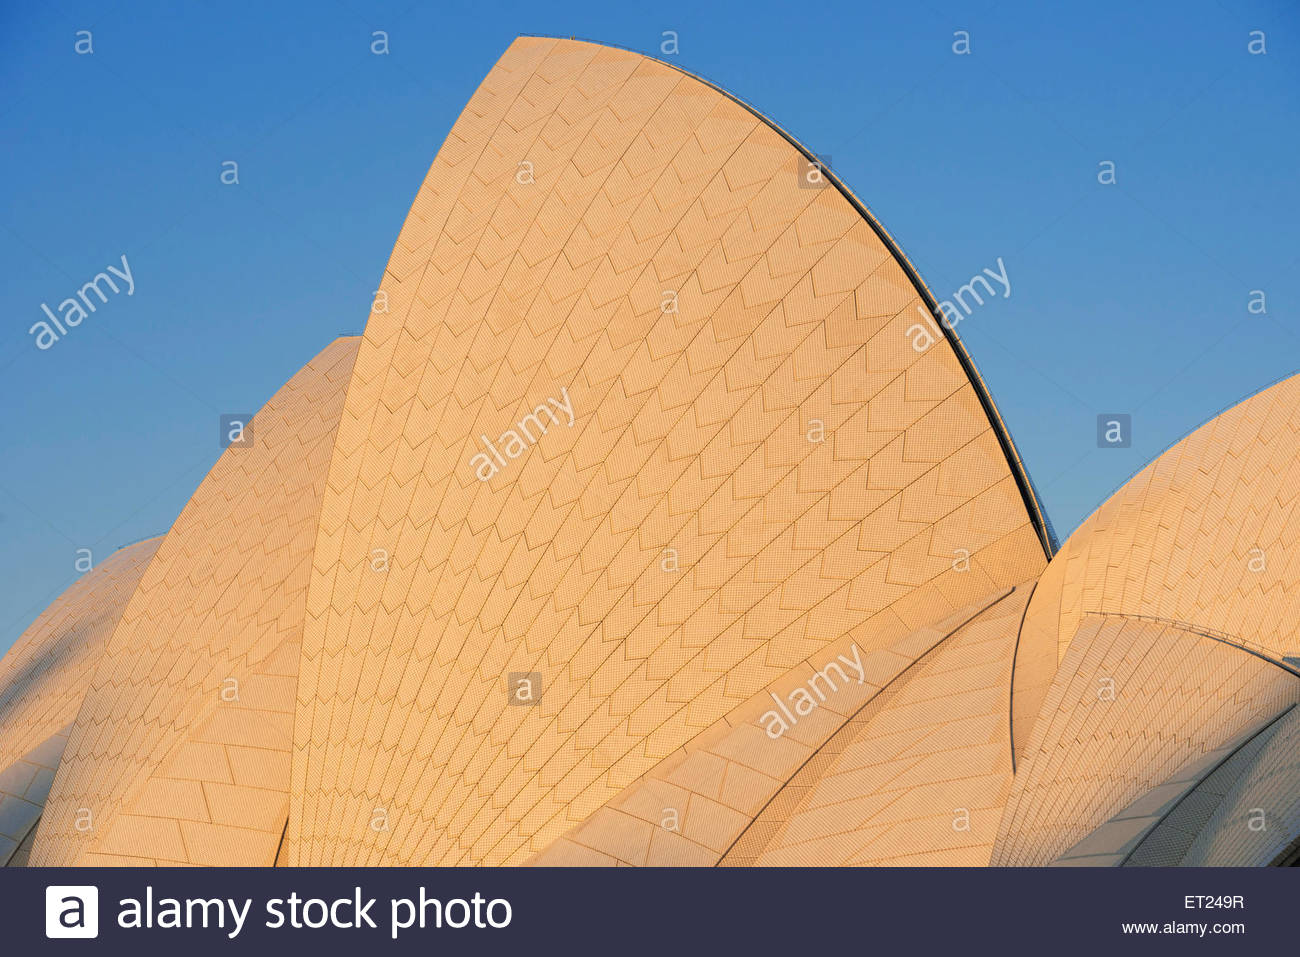 Opera House, Sydney, New South Wales, Australia, - Stock Image